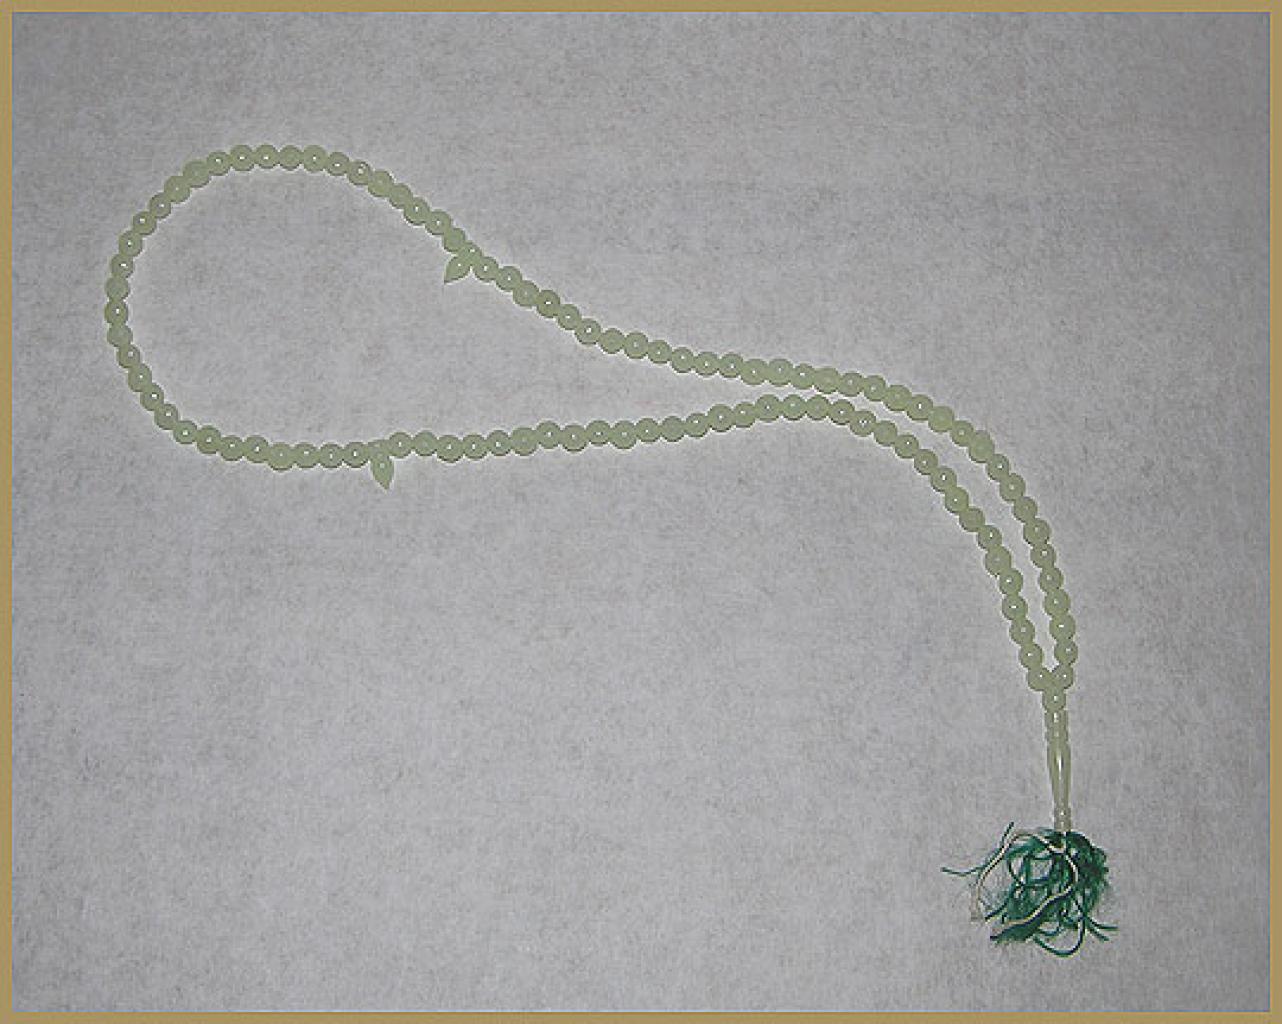 99 Bead Glow in the Dark Prayer Beads  ii605